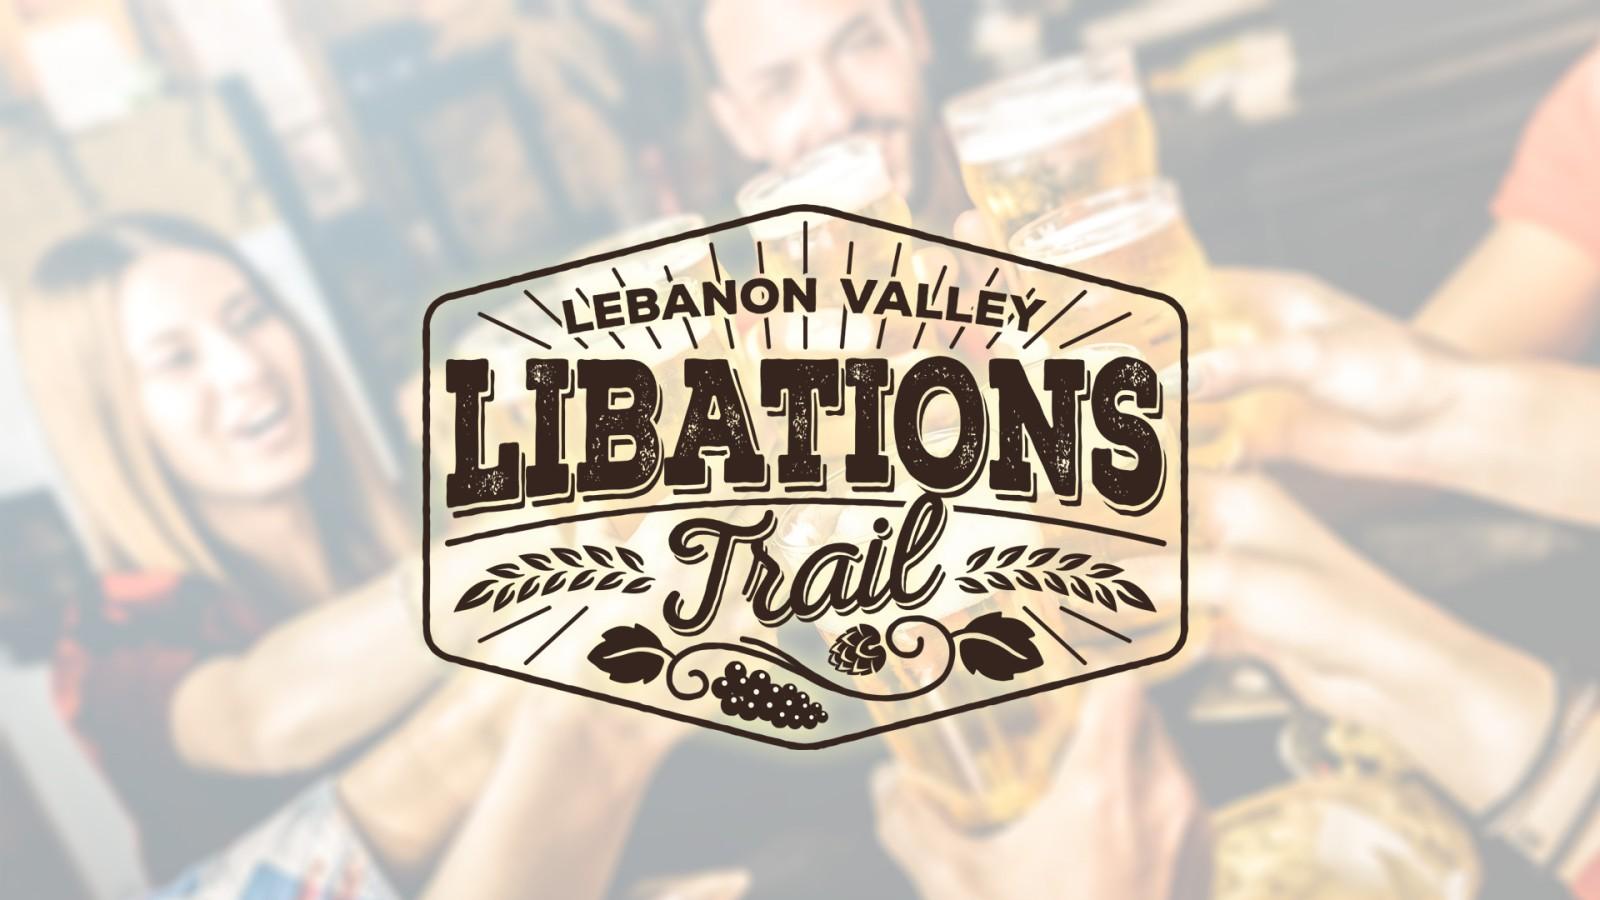 Visit Lebanon Valley, Pennsylvania